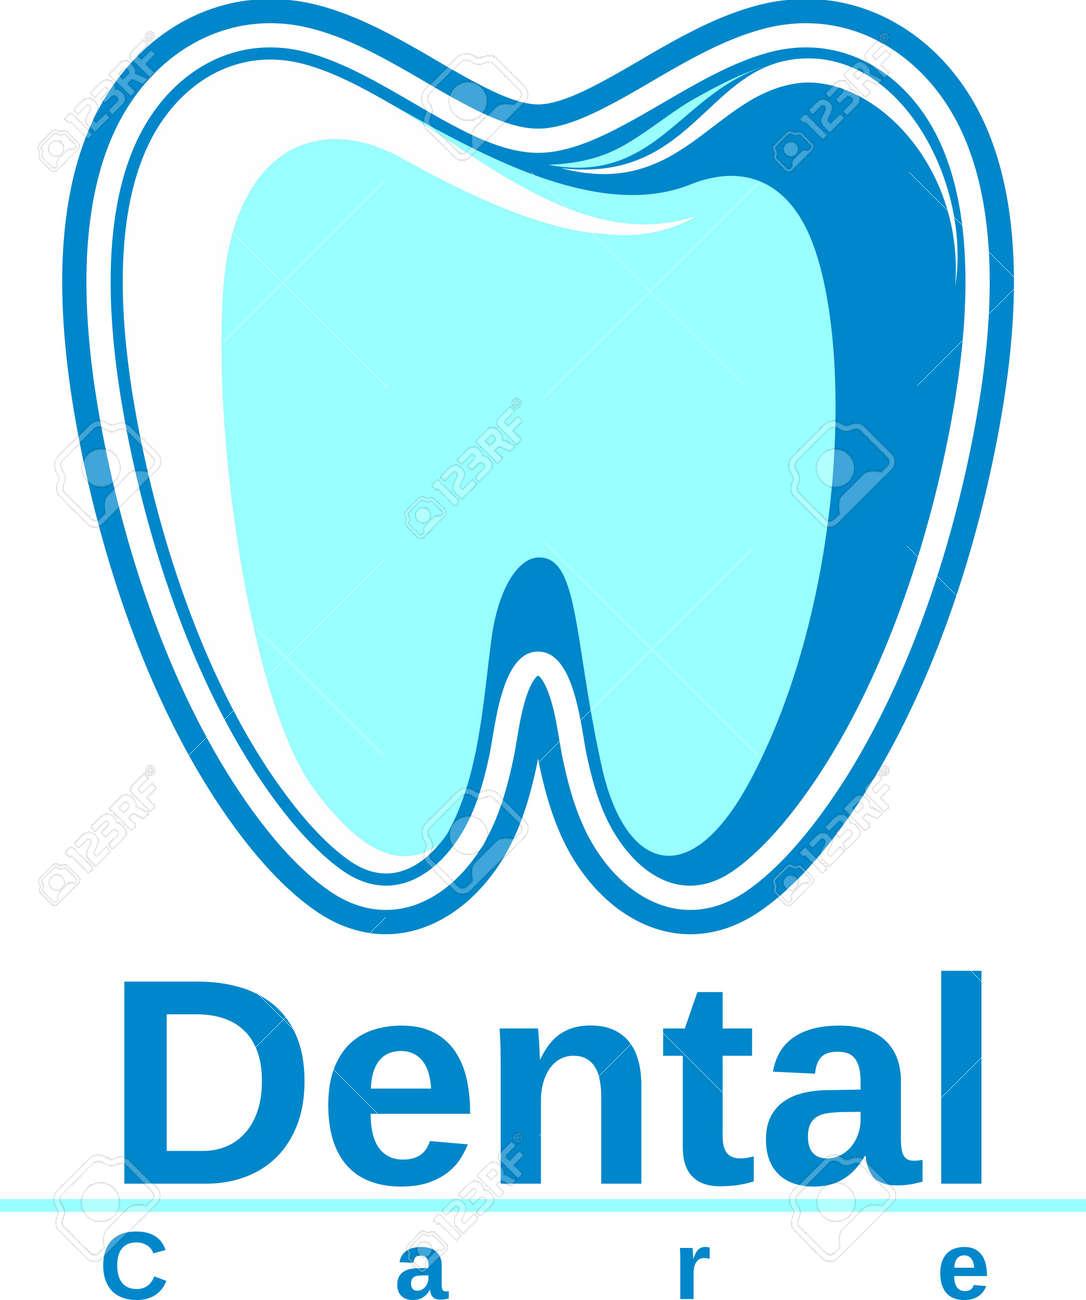 dental logo design royalty free cliparts vectors and stock